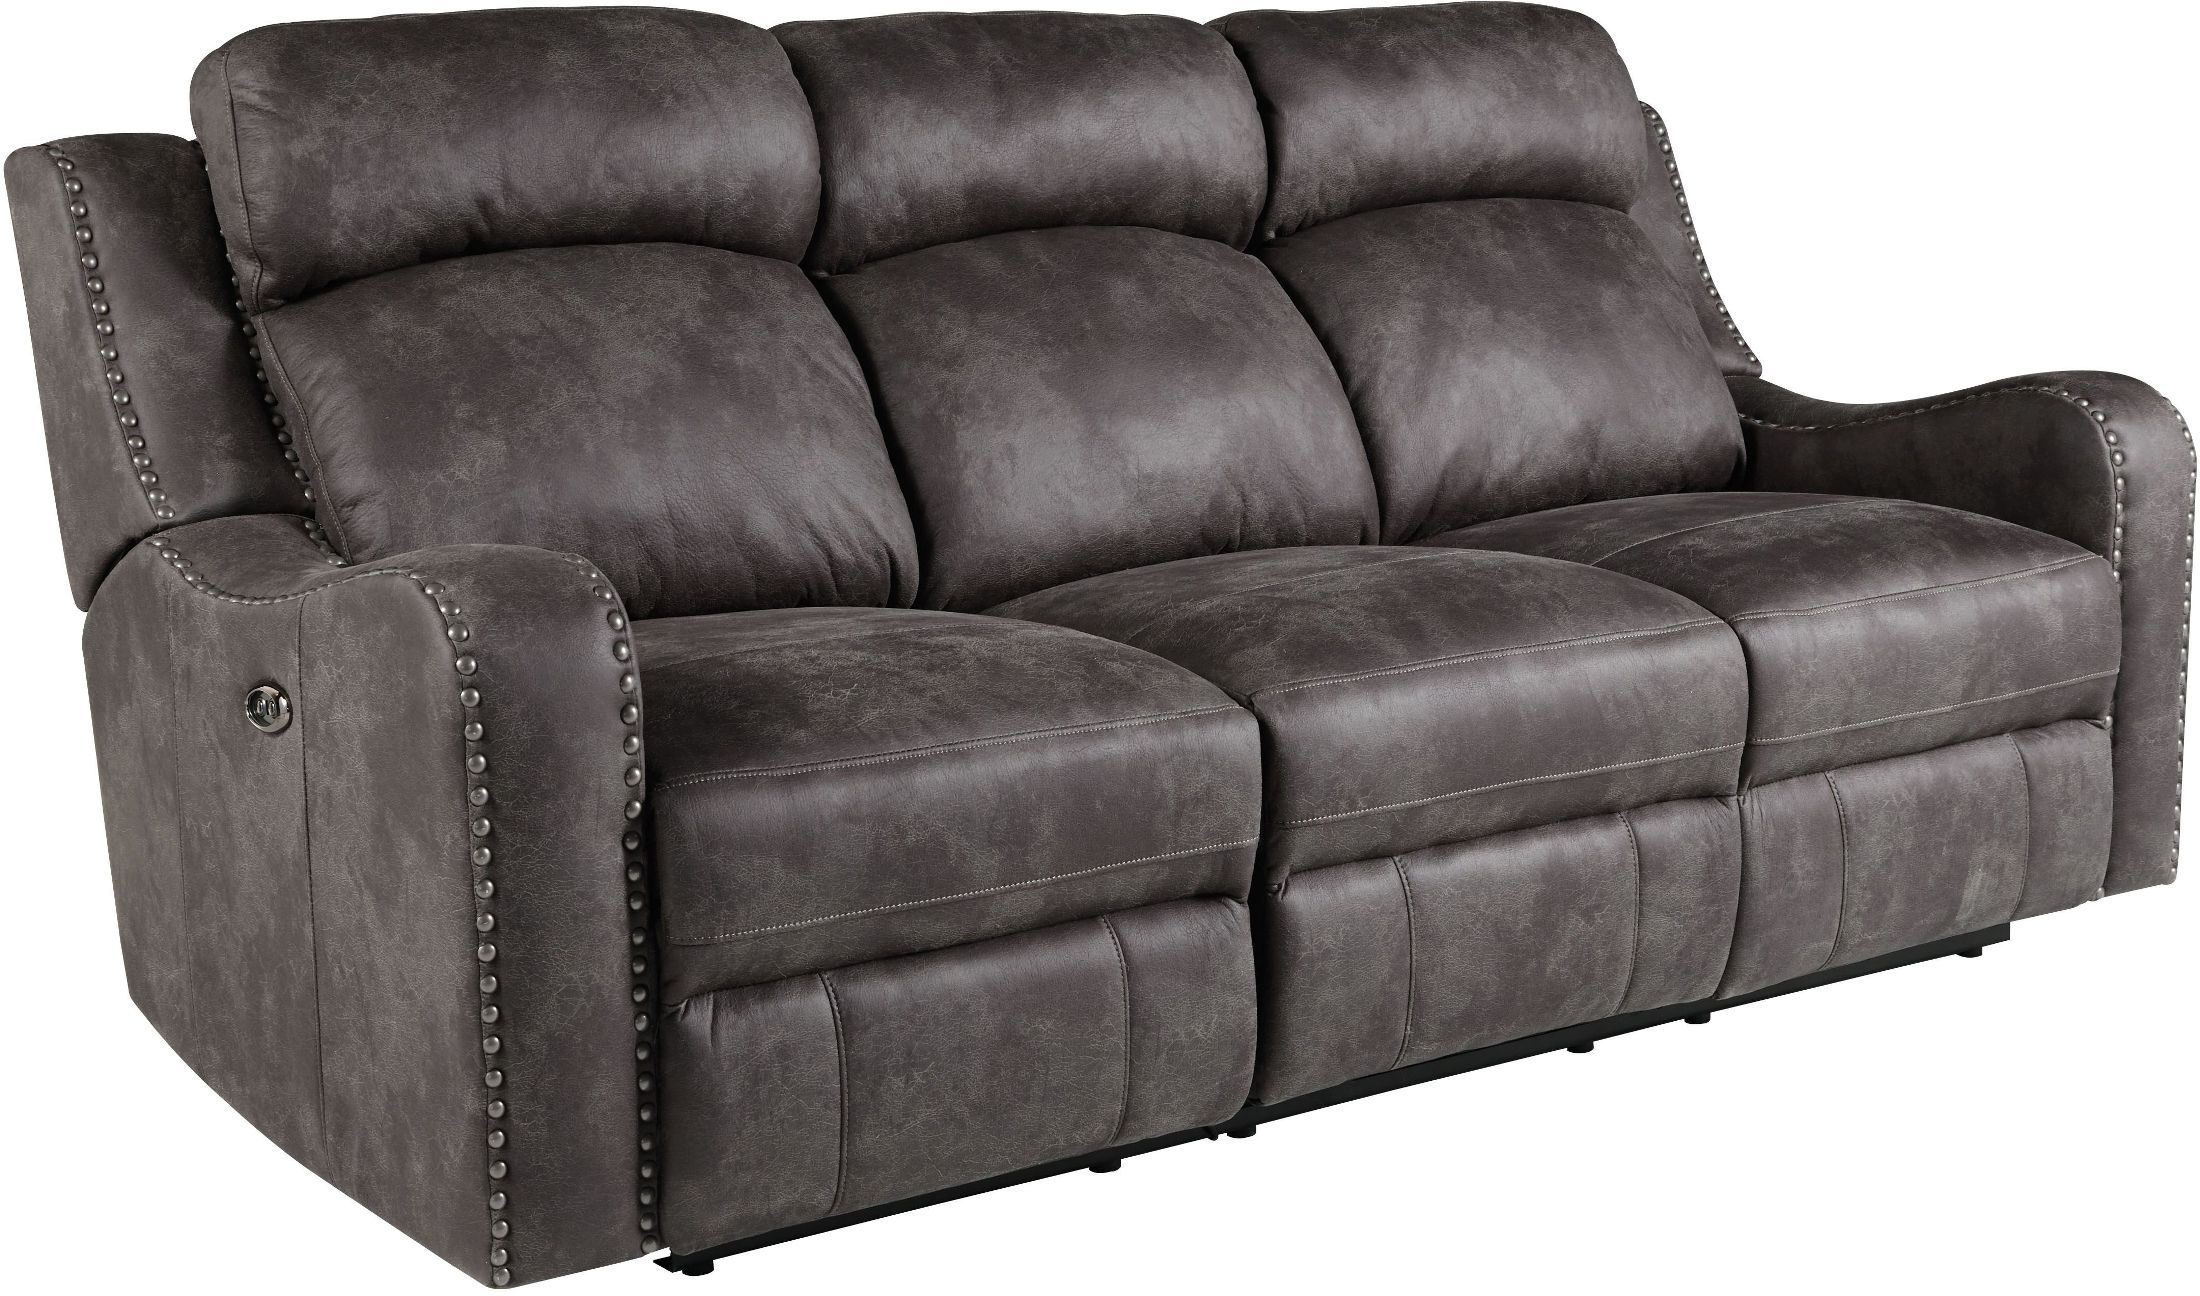 Bankston Gray Reclining Sofa Leather Reclining Sofa Standard